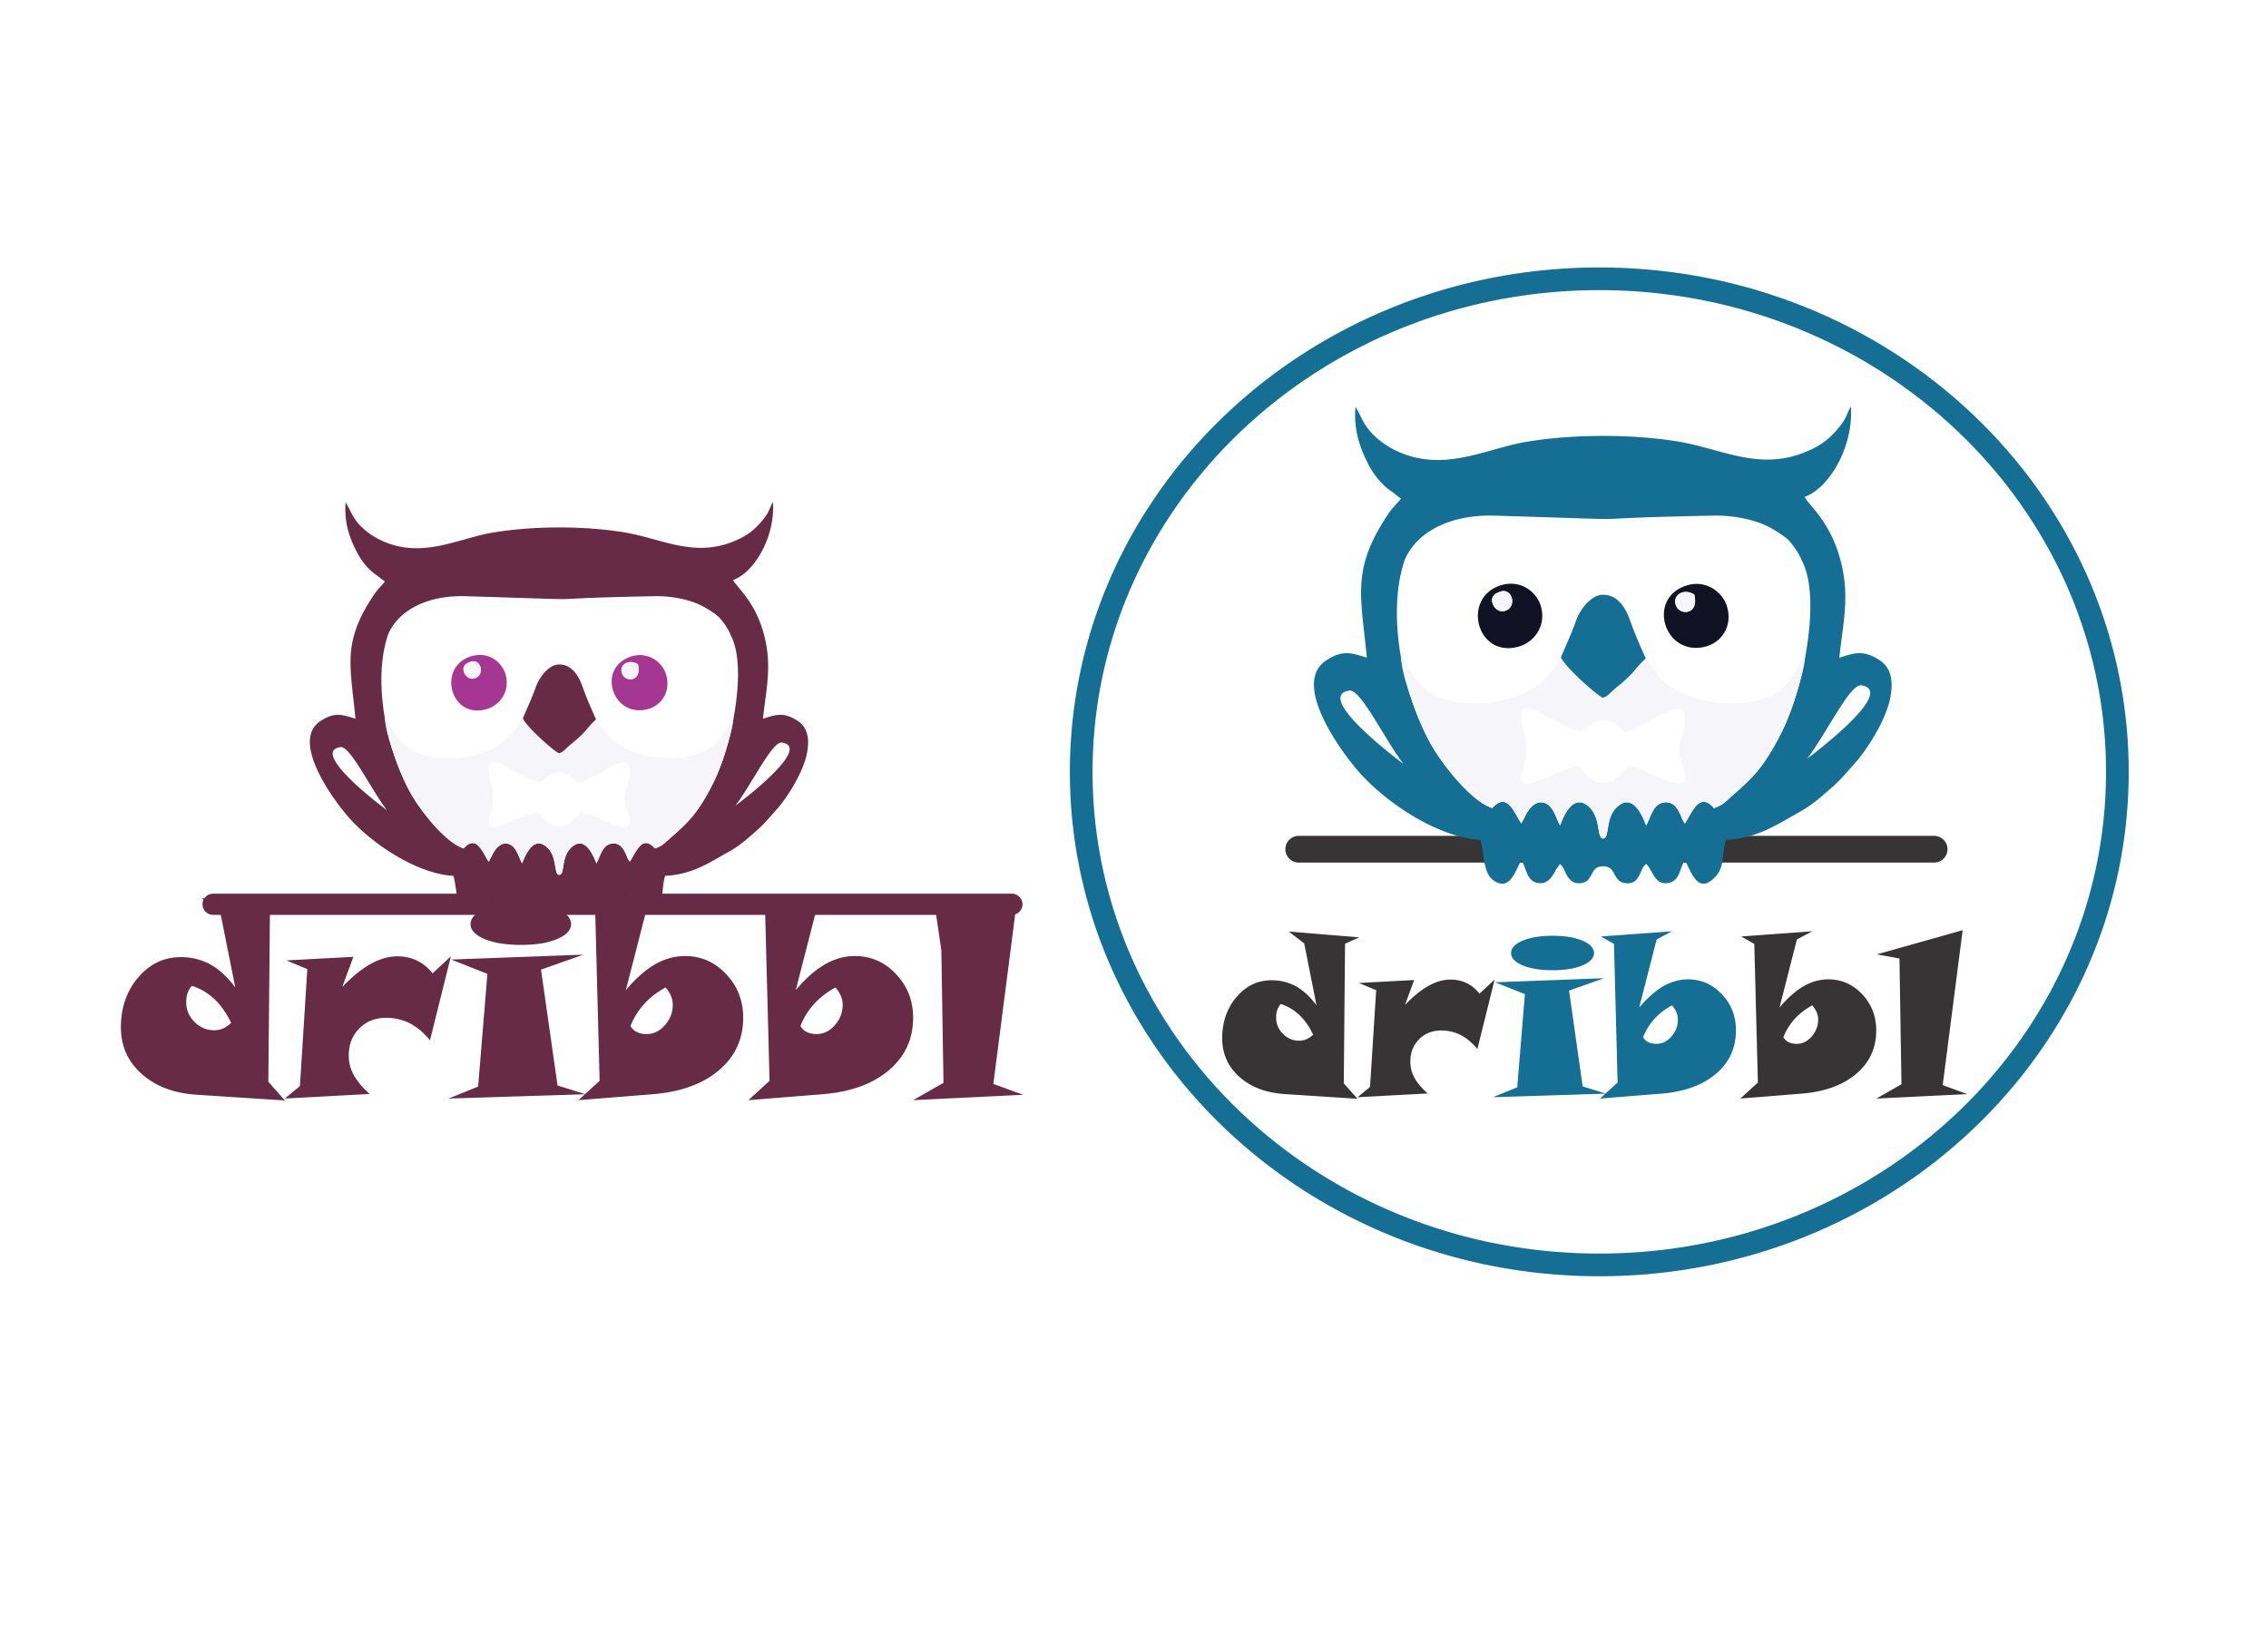 Разработка логотипа для сайта Dribbl.ru фото f_8705a9c34d3089b8.jpg